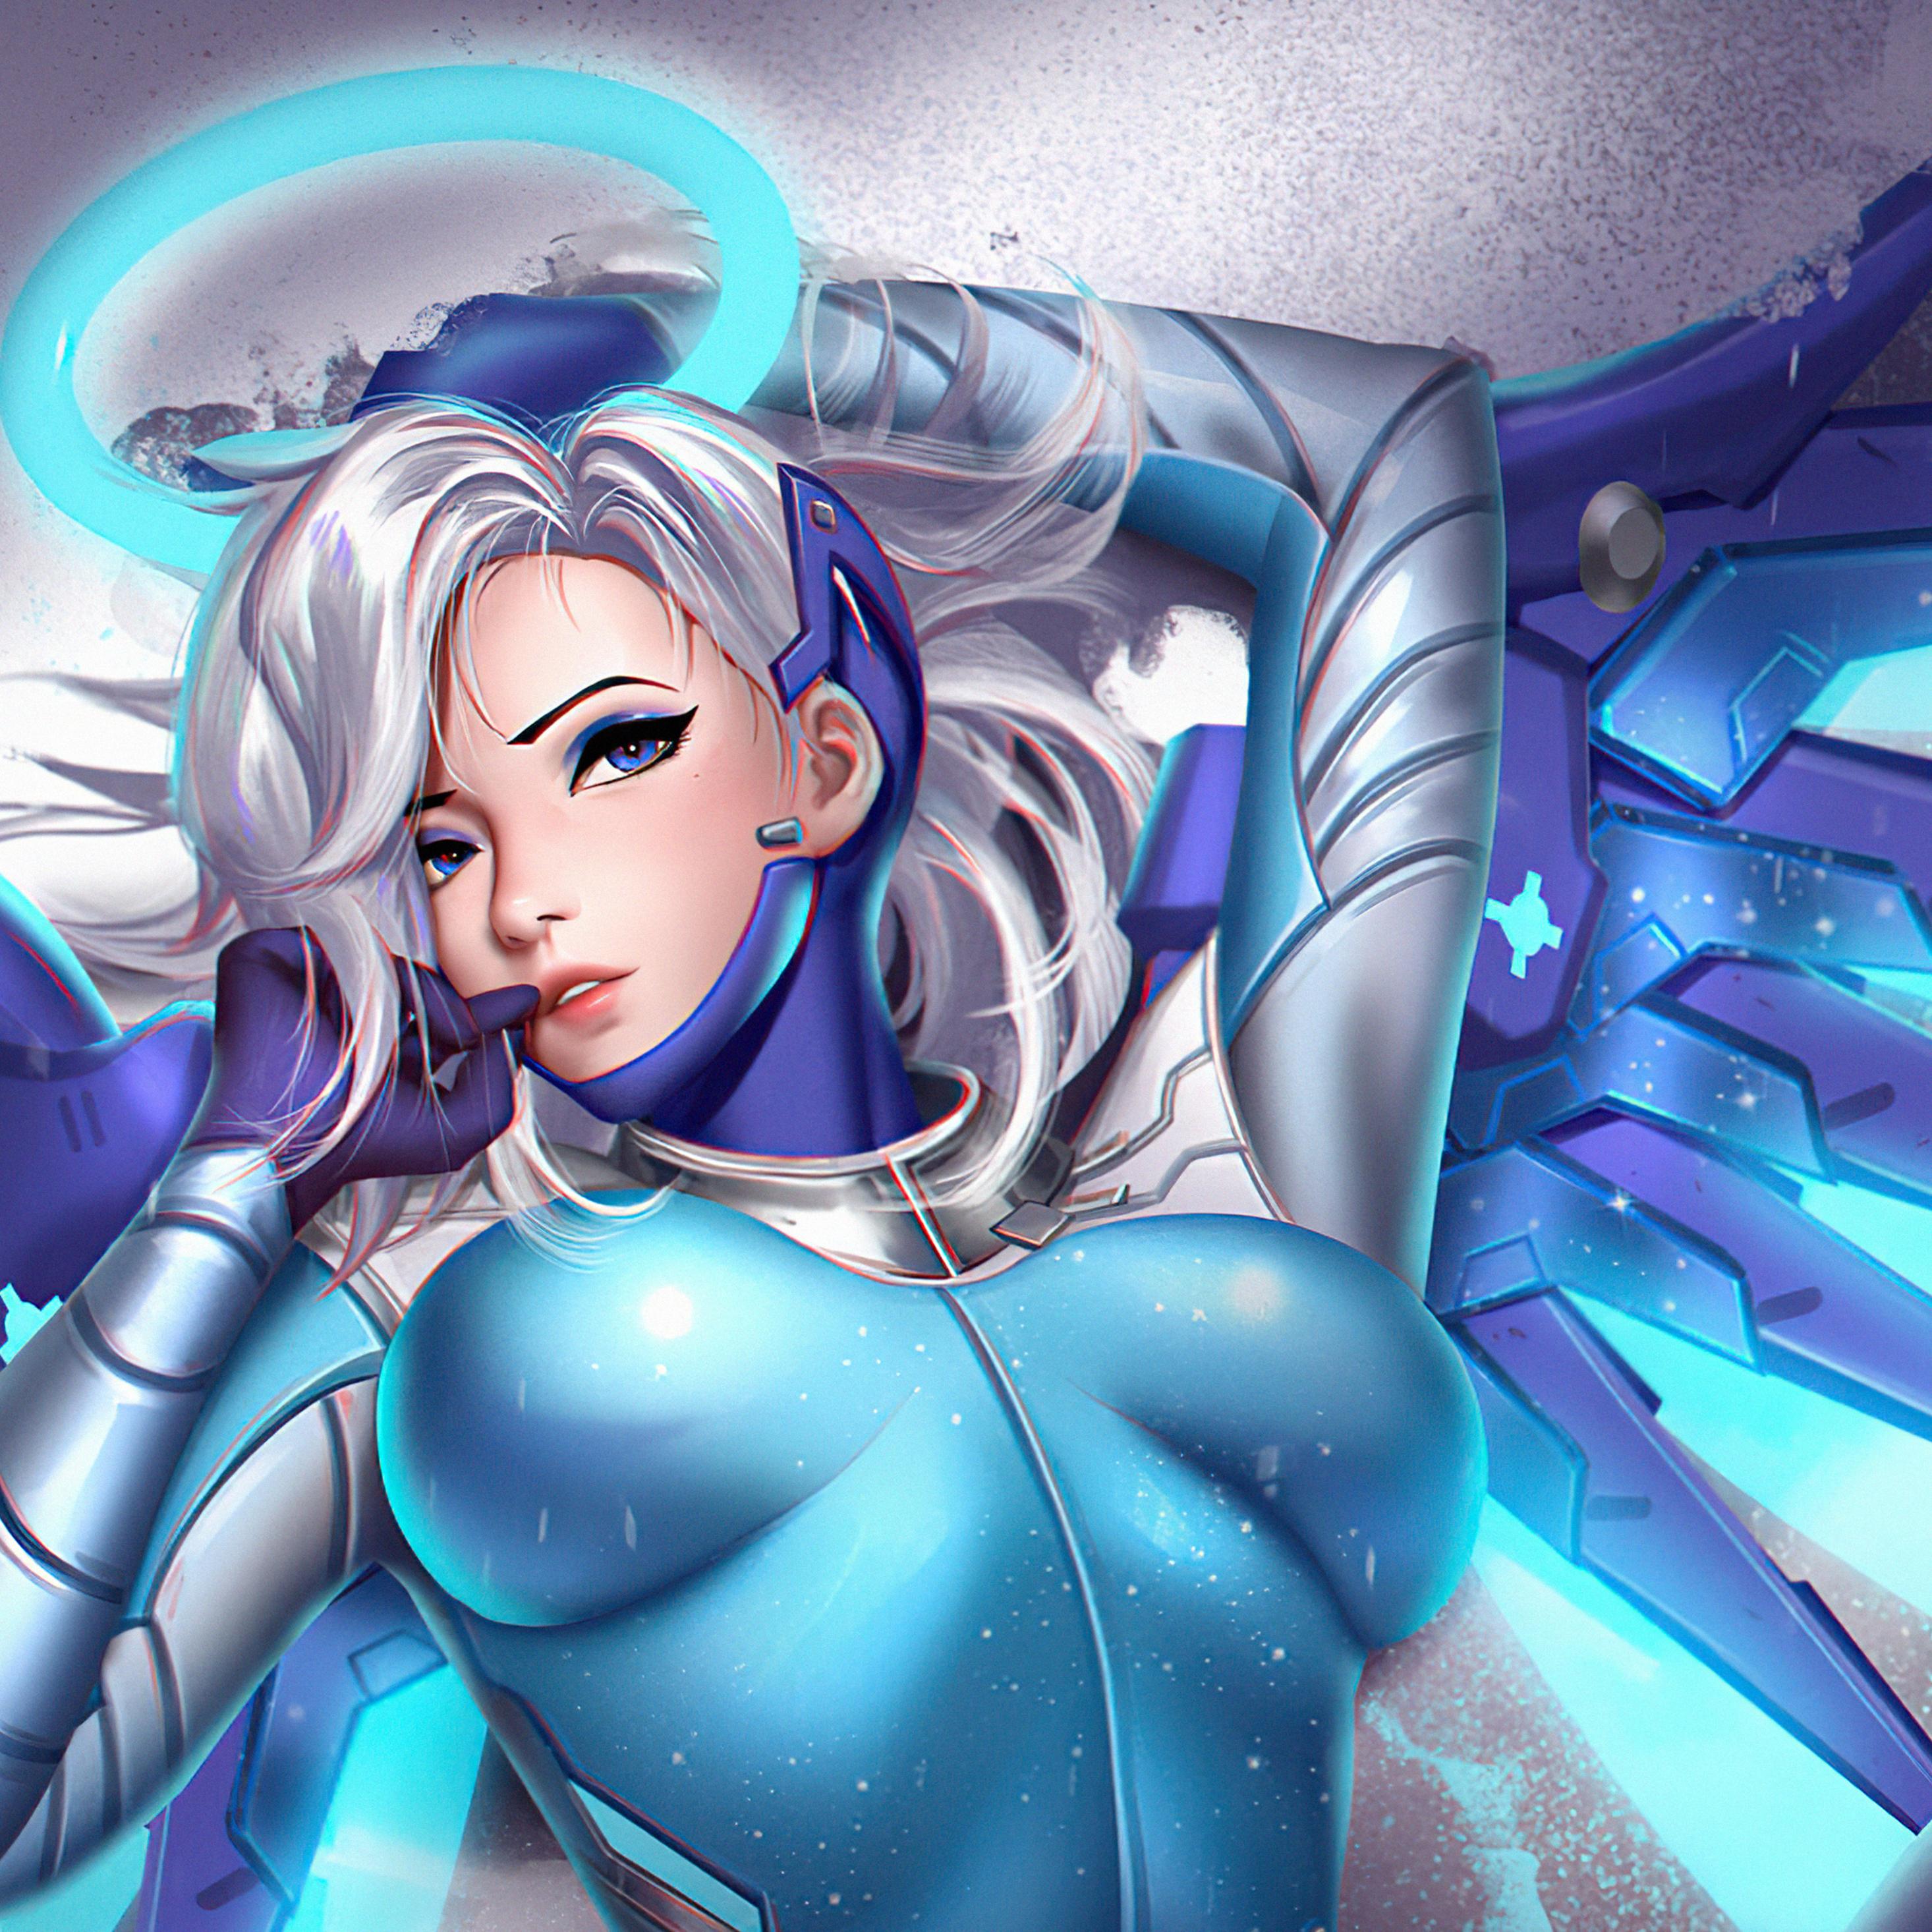 snow-angel-mercy-overwatch-4k-1k.jpg